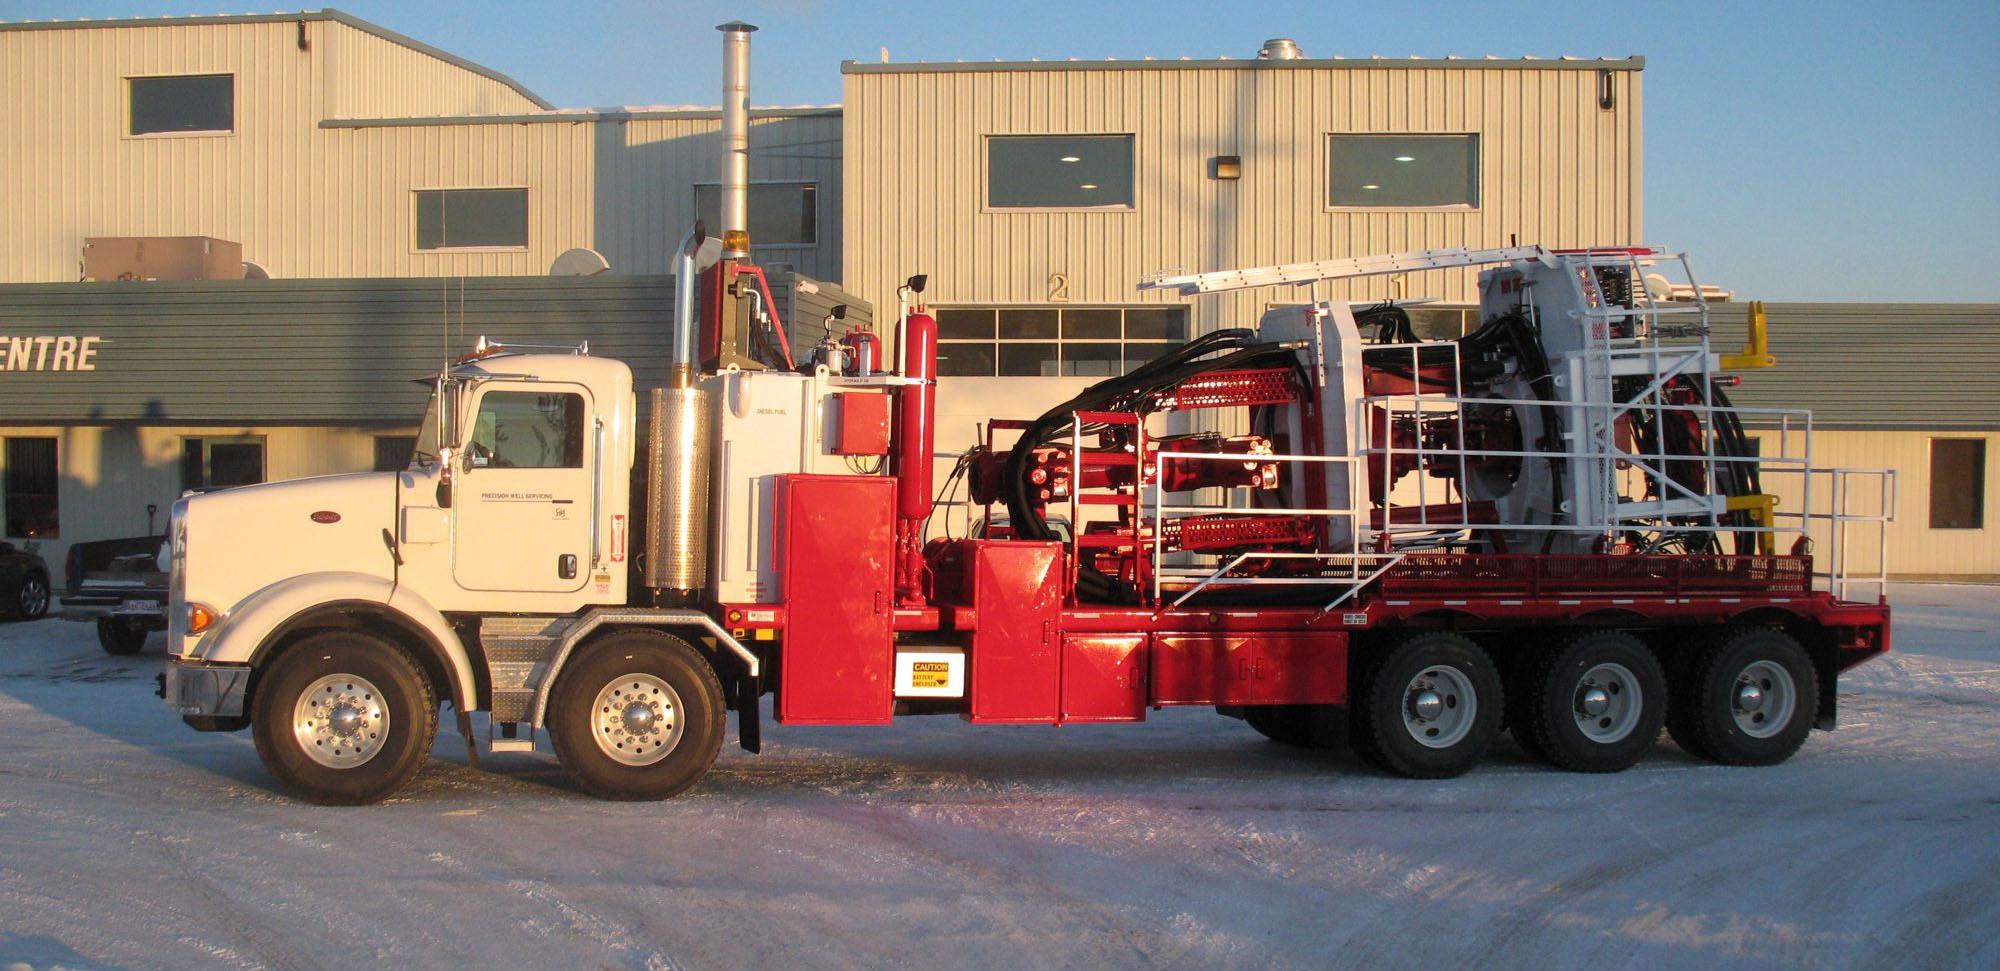 Photo uploaded by Edmonton Fabrication Centre